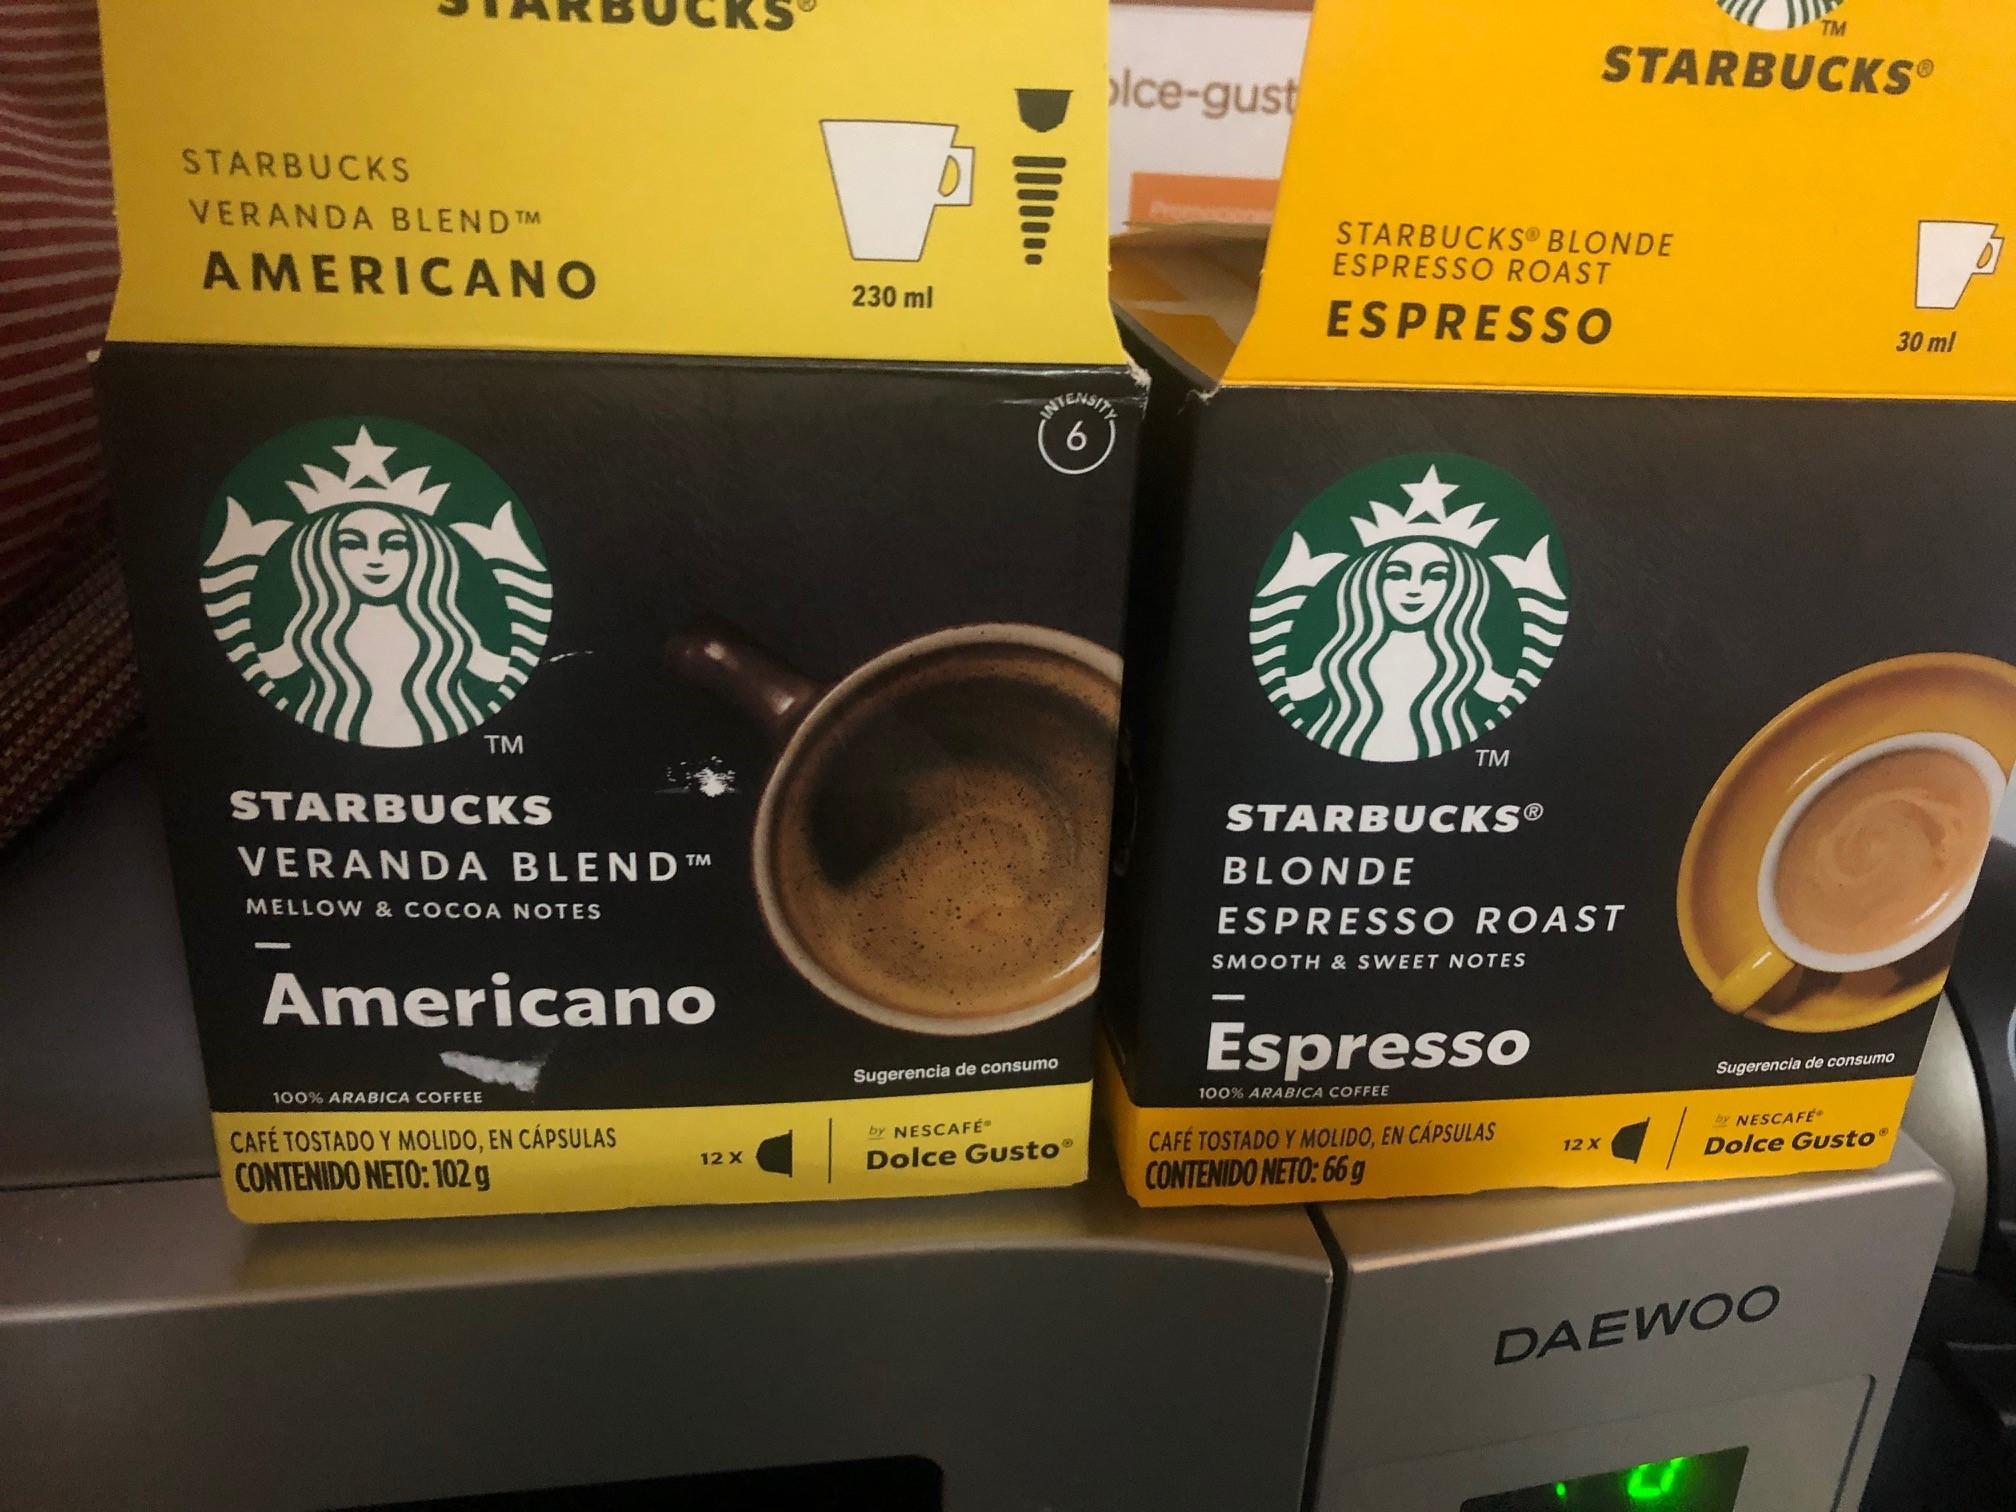 Walmart Nescafé Dolce Gusto Caja starbucks